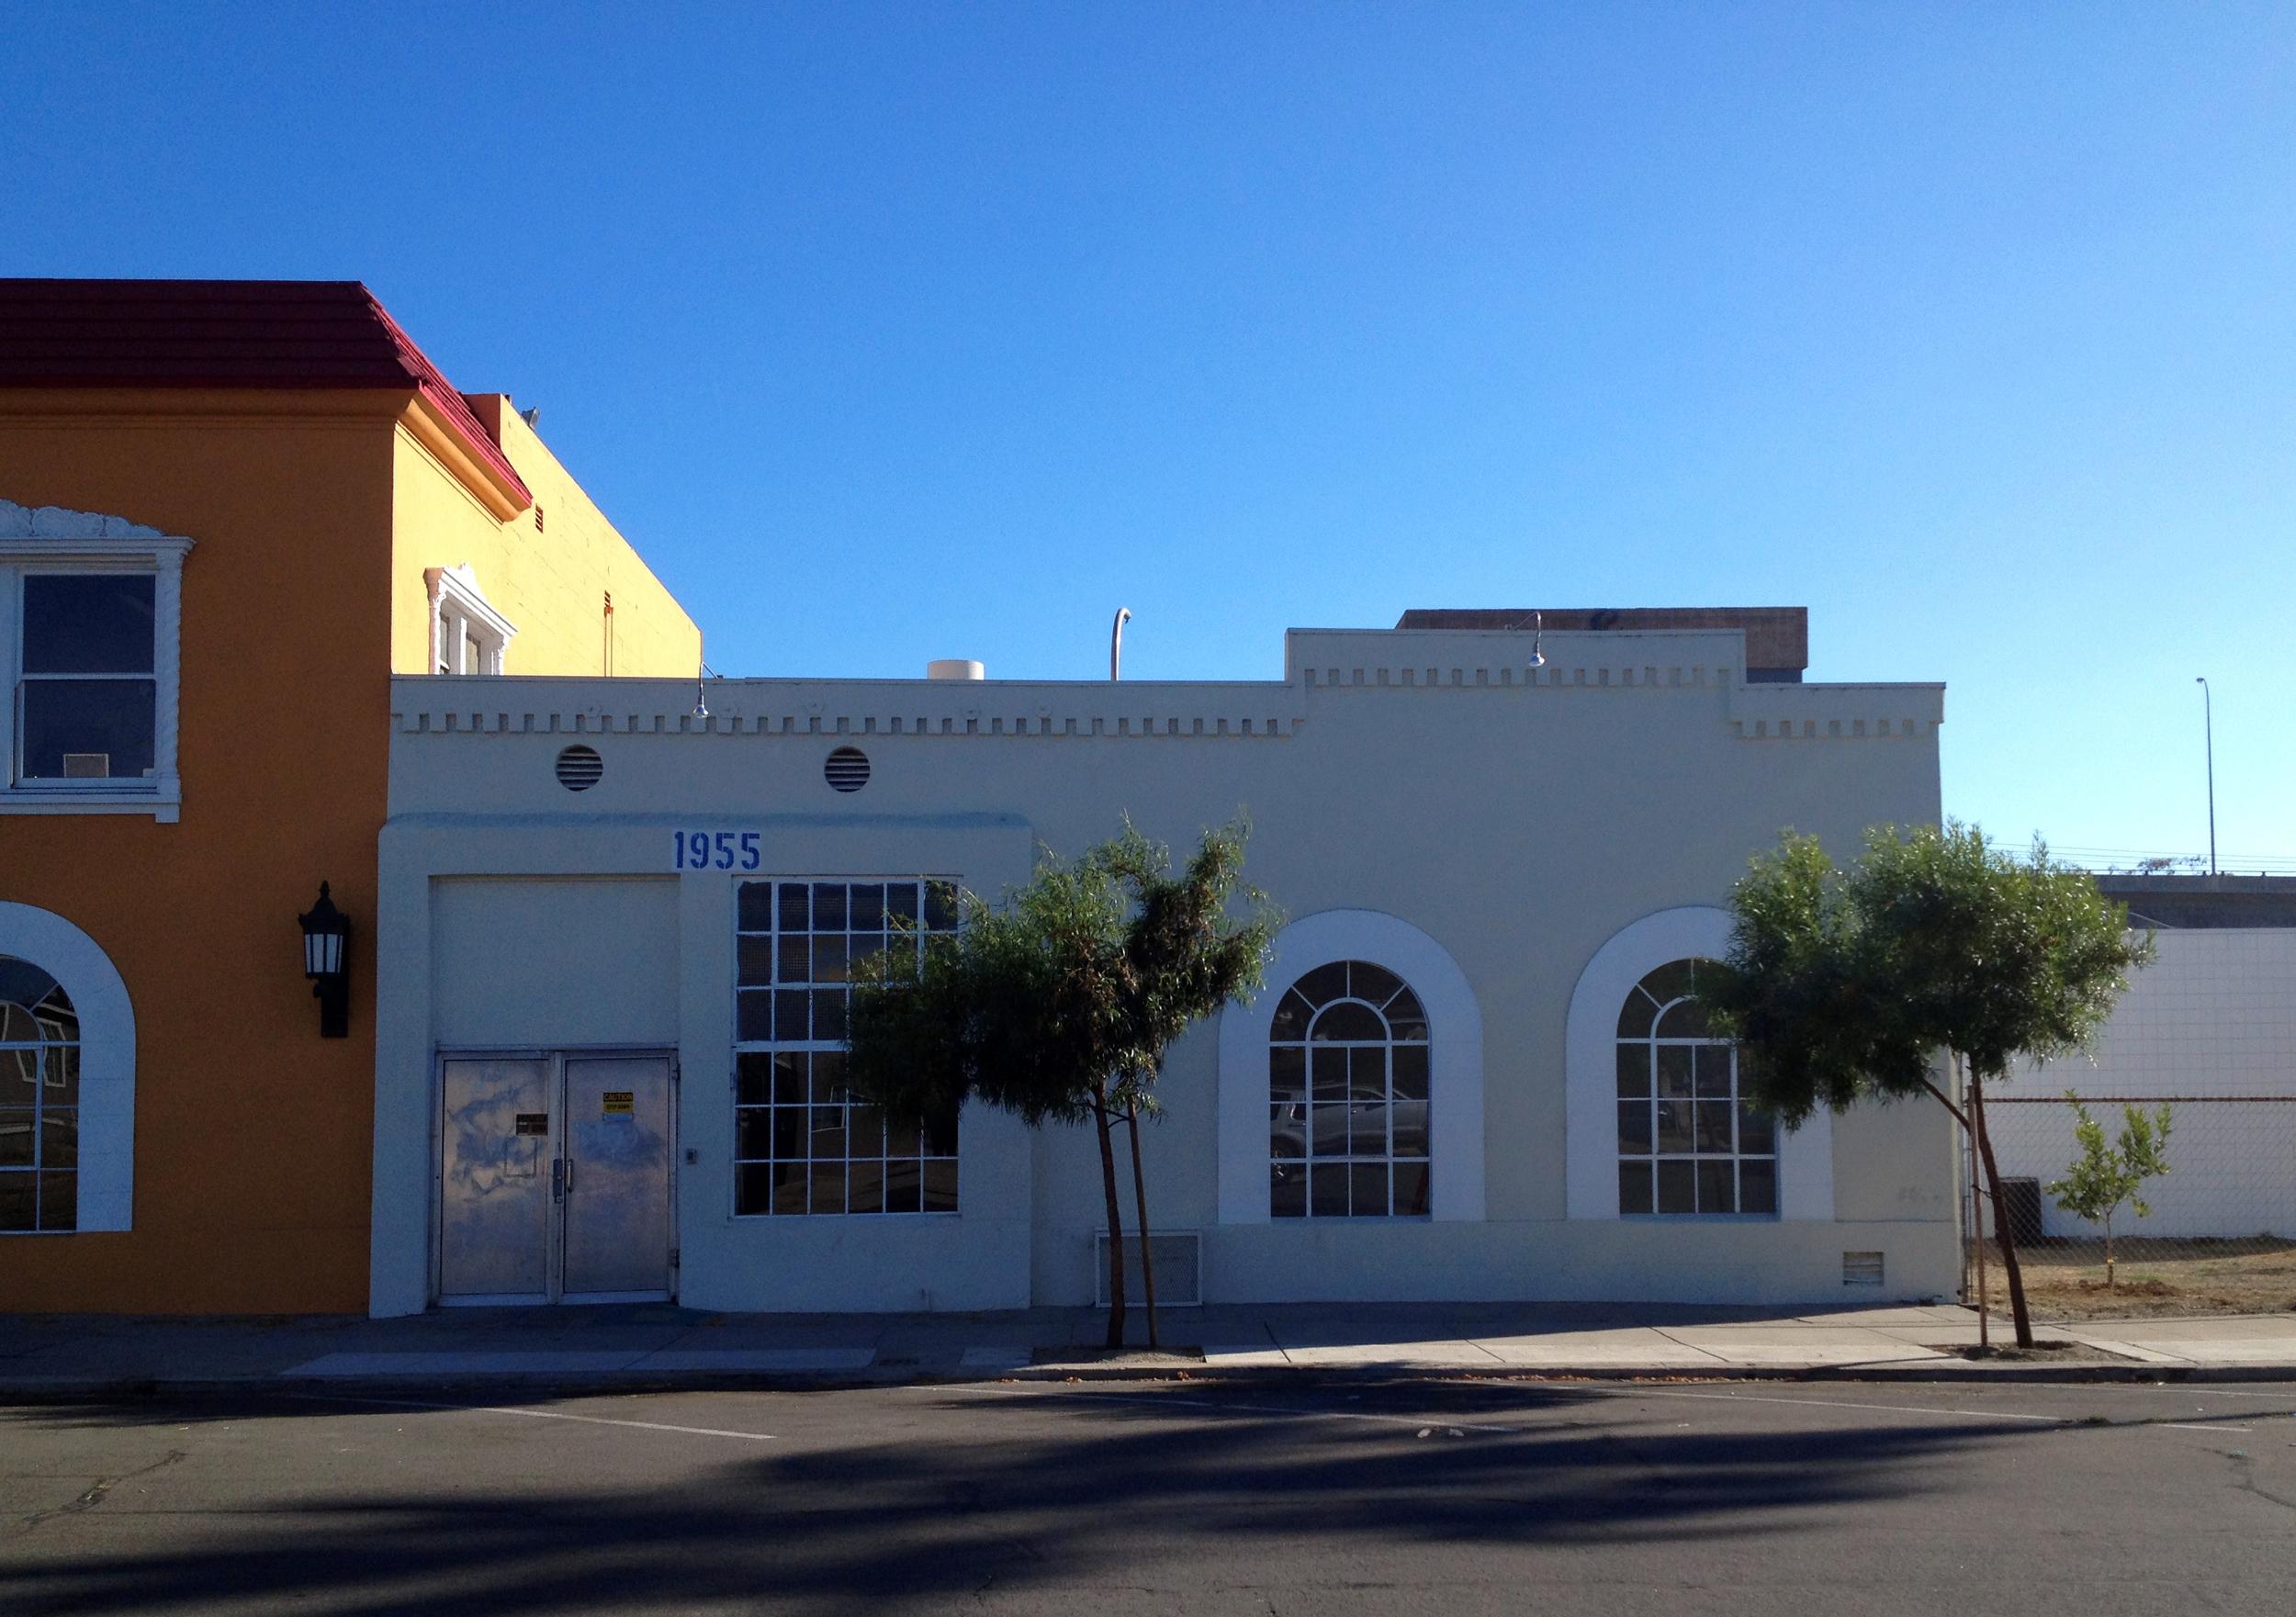 ICE Gallery facade